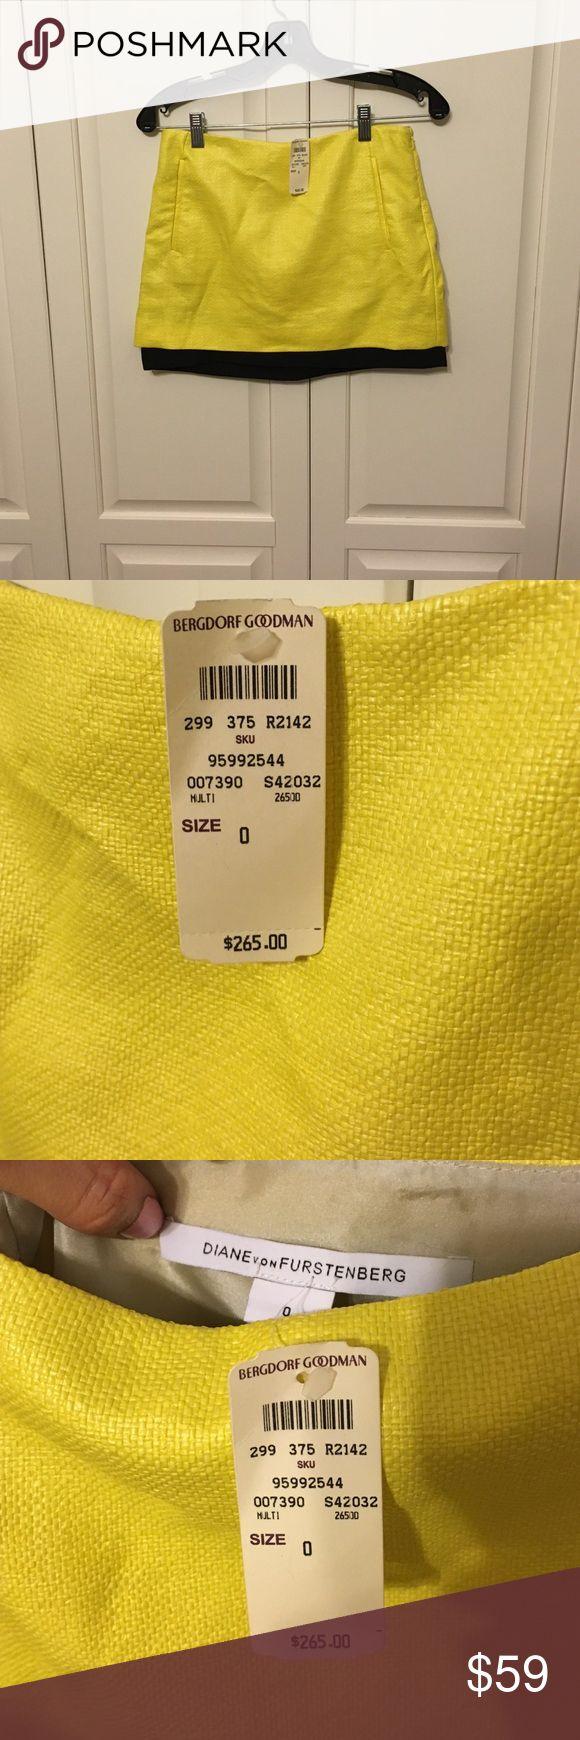 Selling this NWT Diane von Furstenberg Raffia Mini Skirt on Poshmark! My username is: emcg25. #shopmycloset #poshmark #fashion #shopping #style #forsale #dianevonfurstenberg #dvf #Skirts #colorblock #neon #raffia #miniskirt #yellow #black